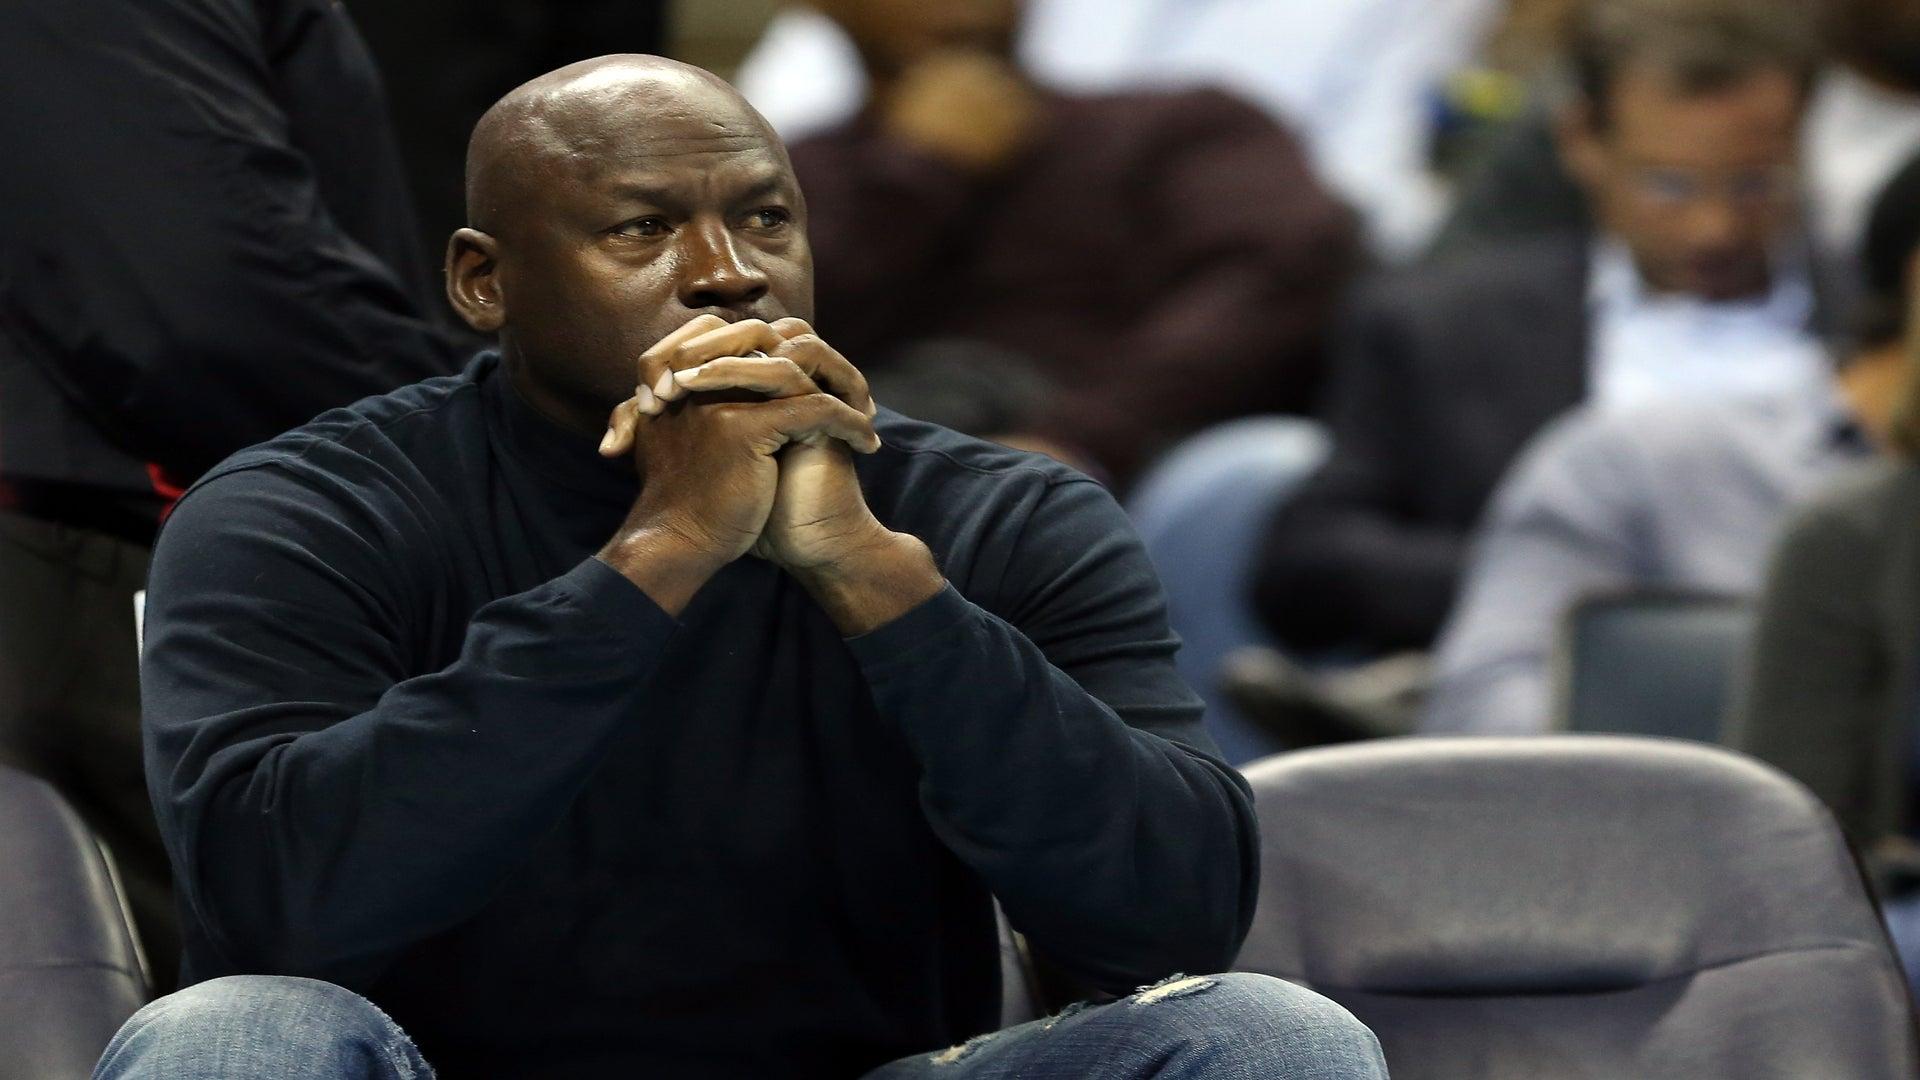 NBA Legend Michael Jordan Donates $2 Million to Hurricane Florence Relief Efforts